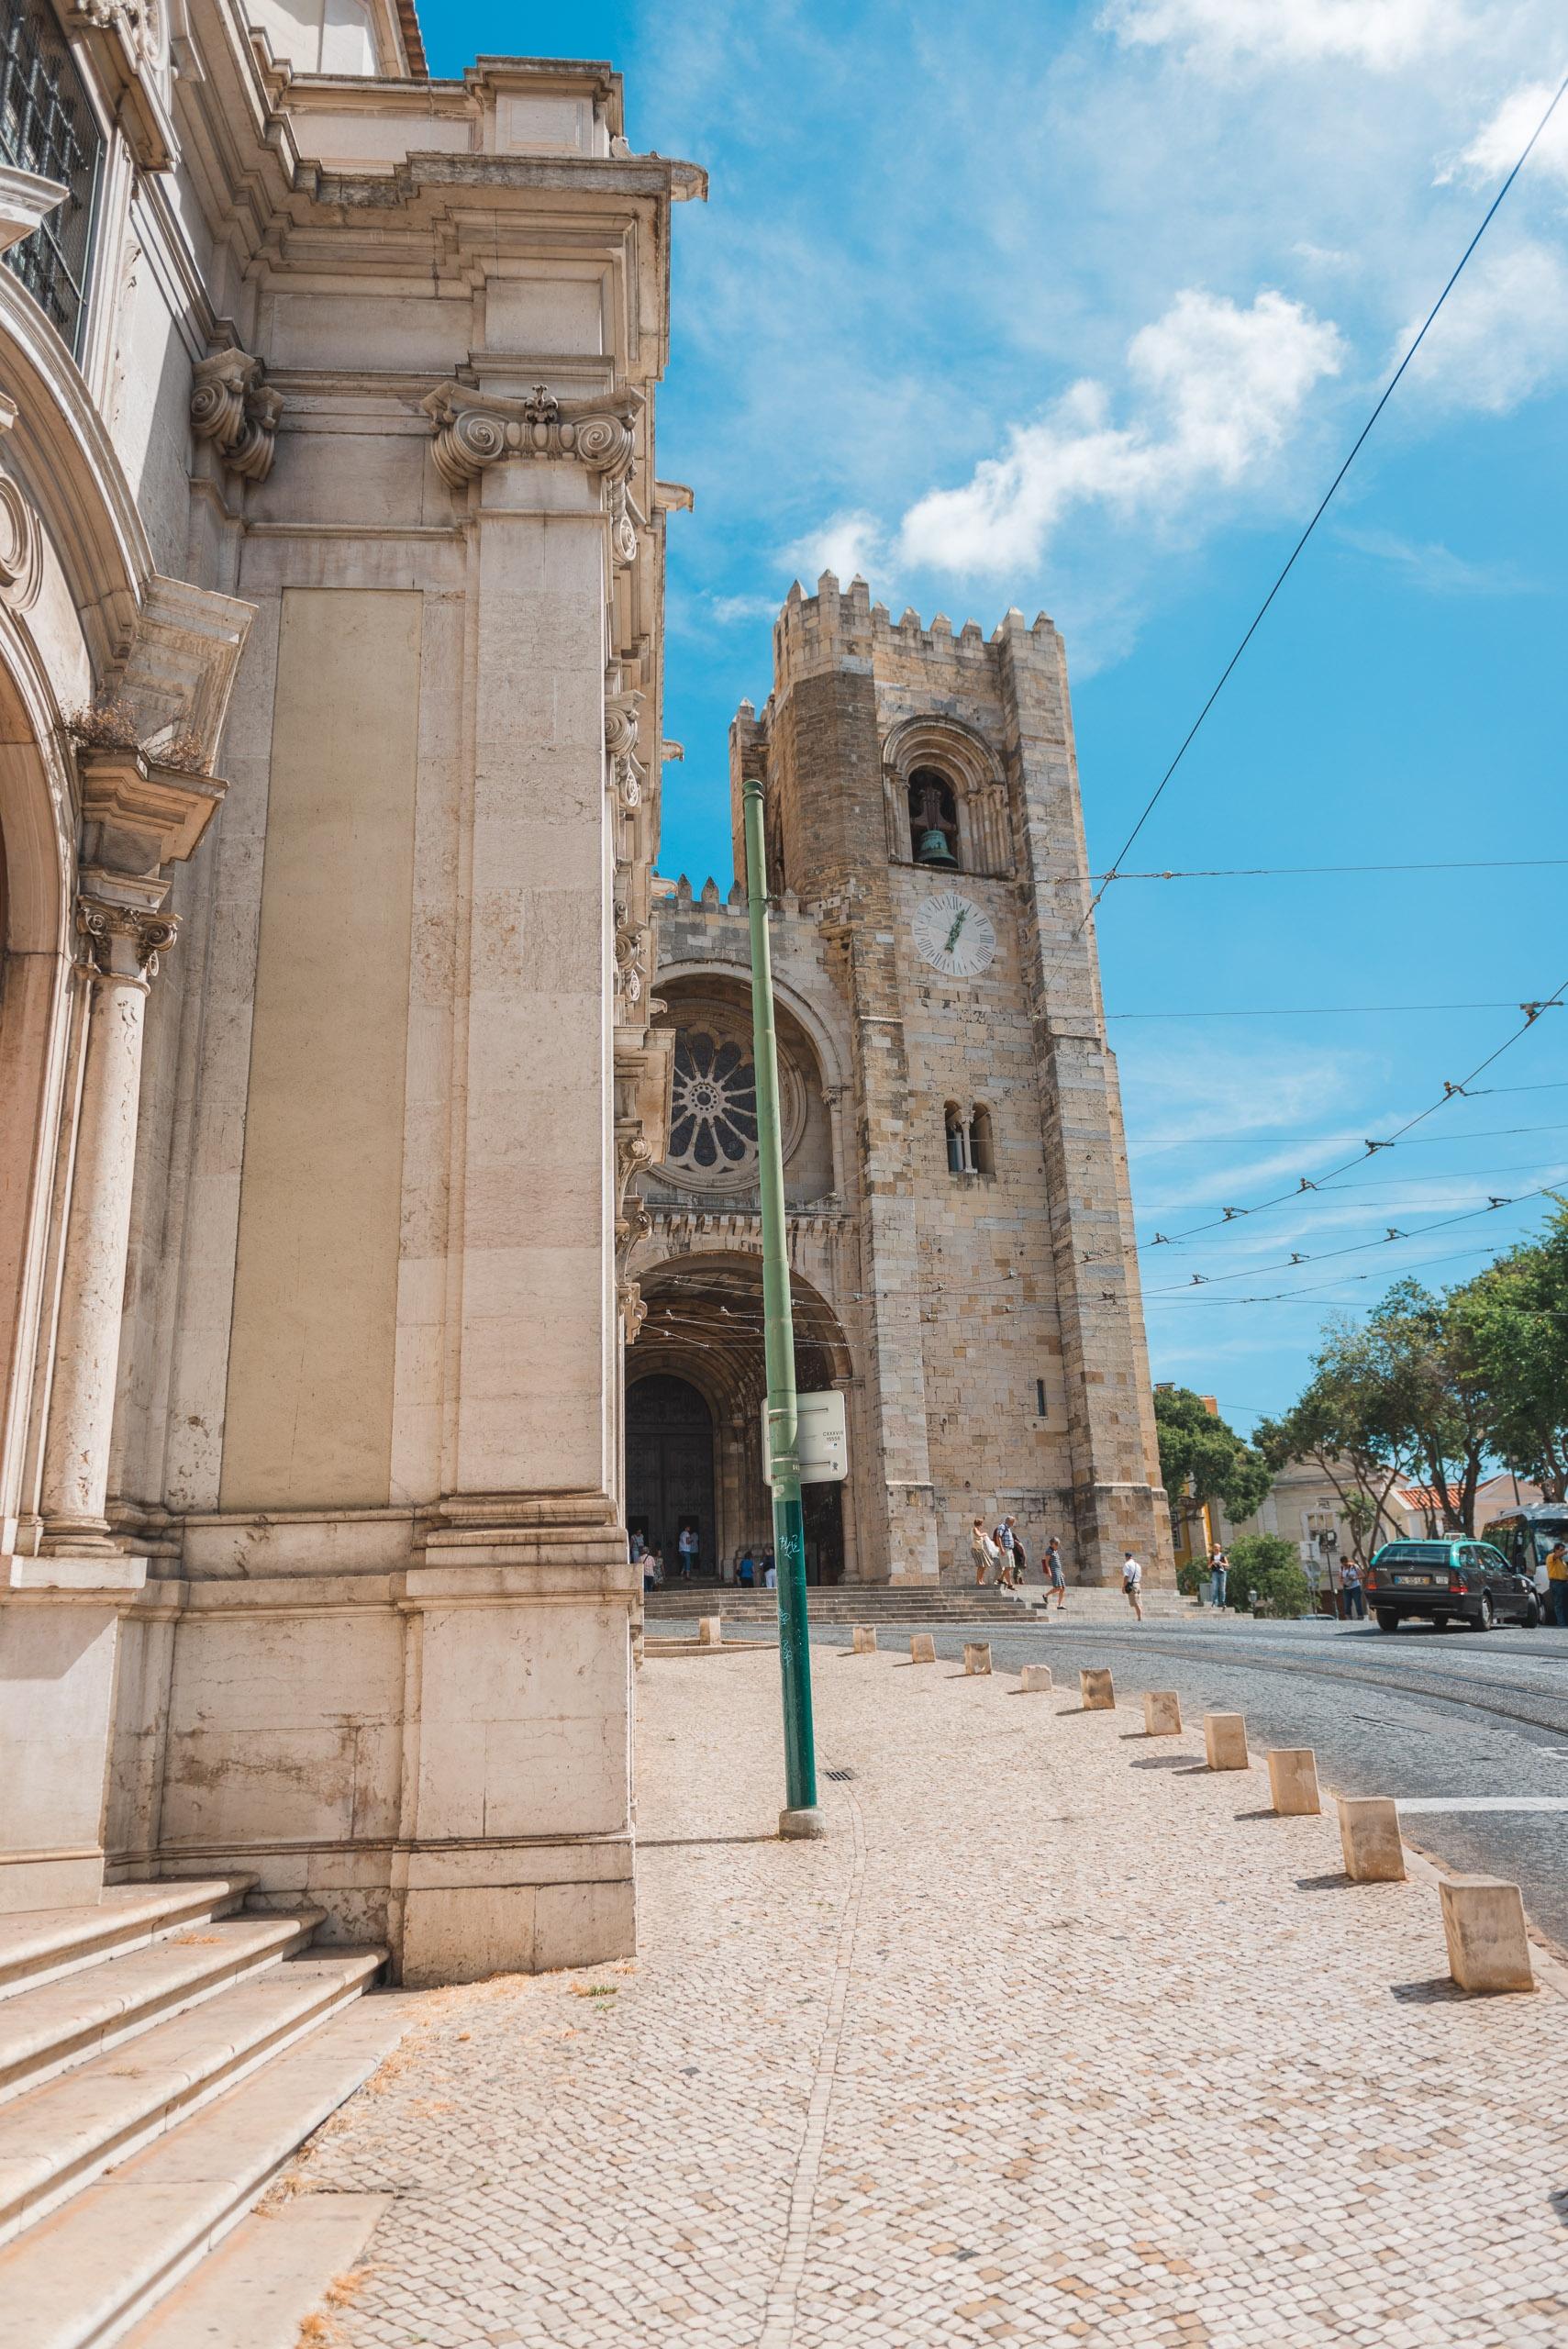 Portugal - Lisbon - 2012-0921-DSC_1372_39174